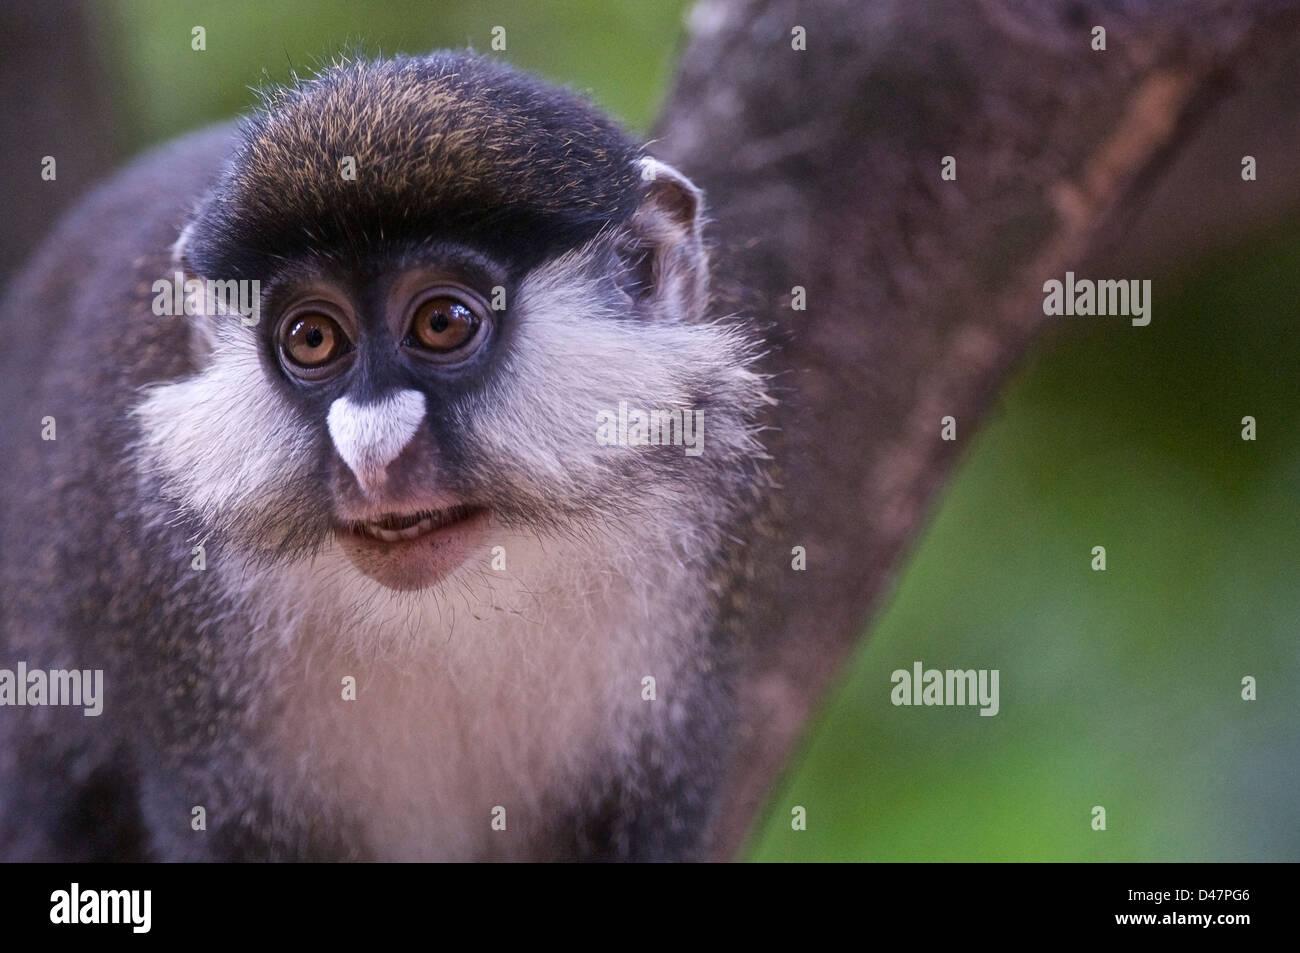 Red-Tailed Monkey, Cercopithecus ascanius. - Stock Image